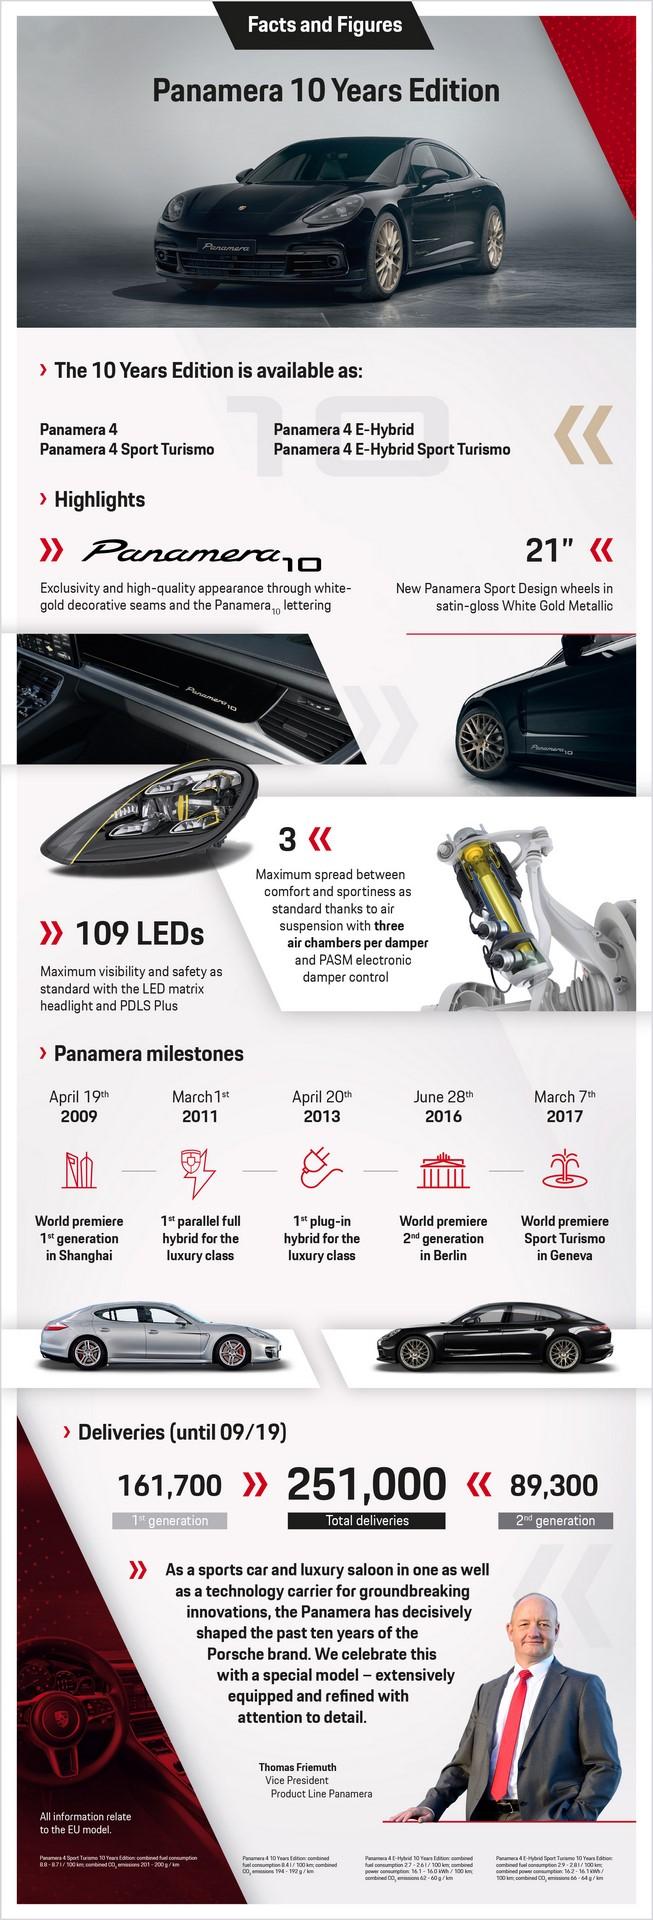 13.09.2019_PORSCHE_Infografik_Panamera_Edition_10_Jahre_v1.indd